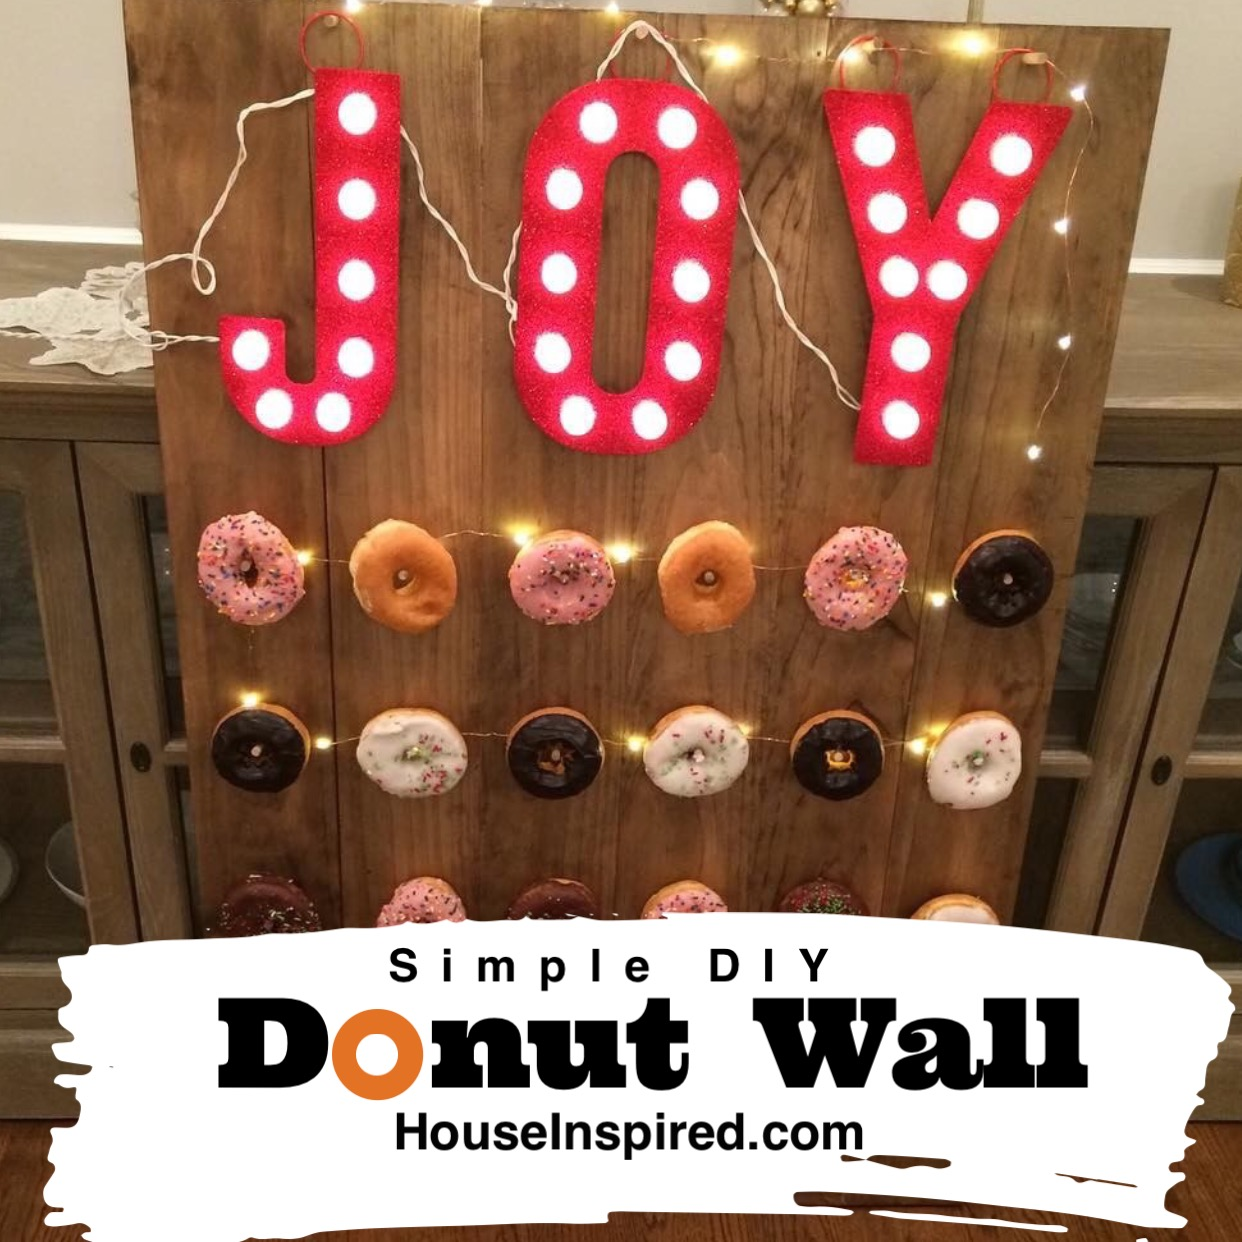 Easy DIY Donut Wall